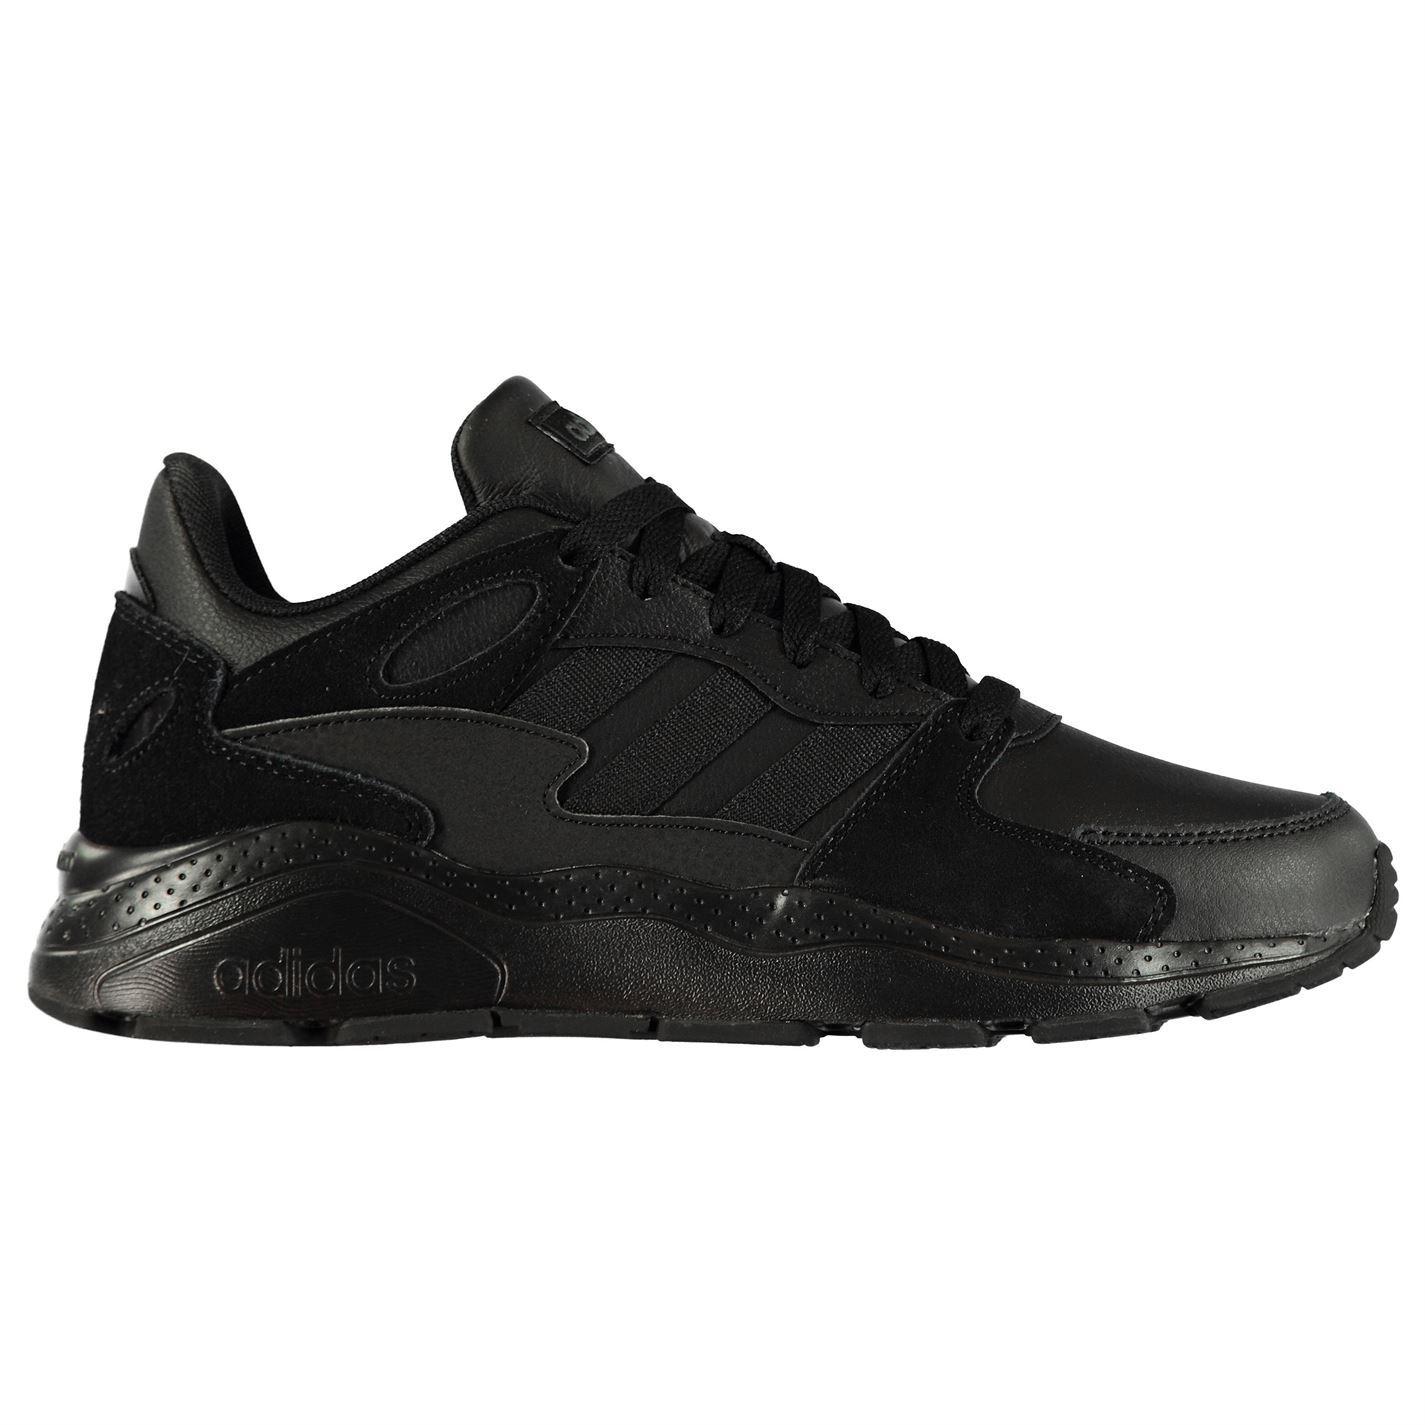 Adidas-Crazychaos-Baskets-Homme-Chaussures-De-Loisirs-Chaussures-Baskets miniature 4